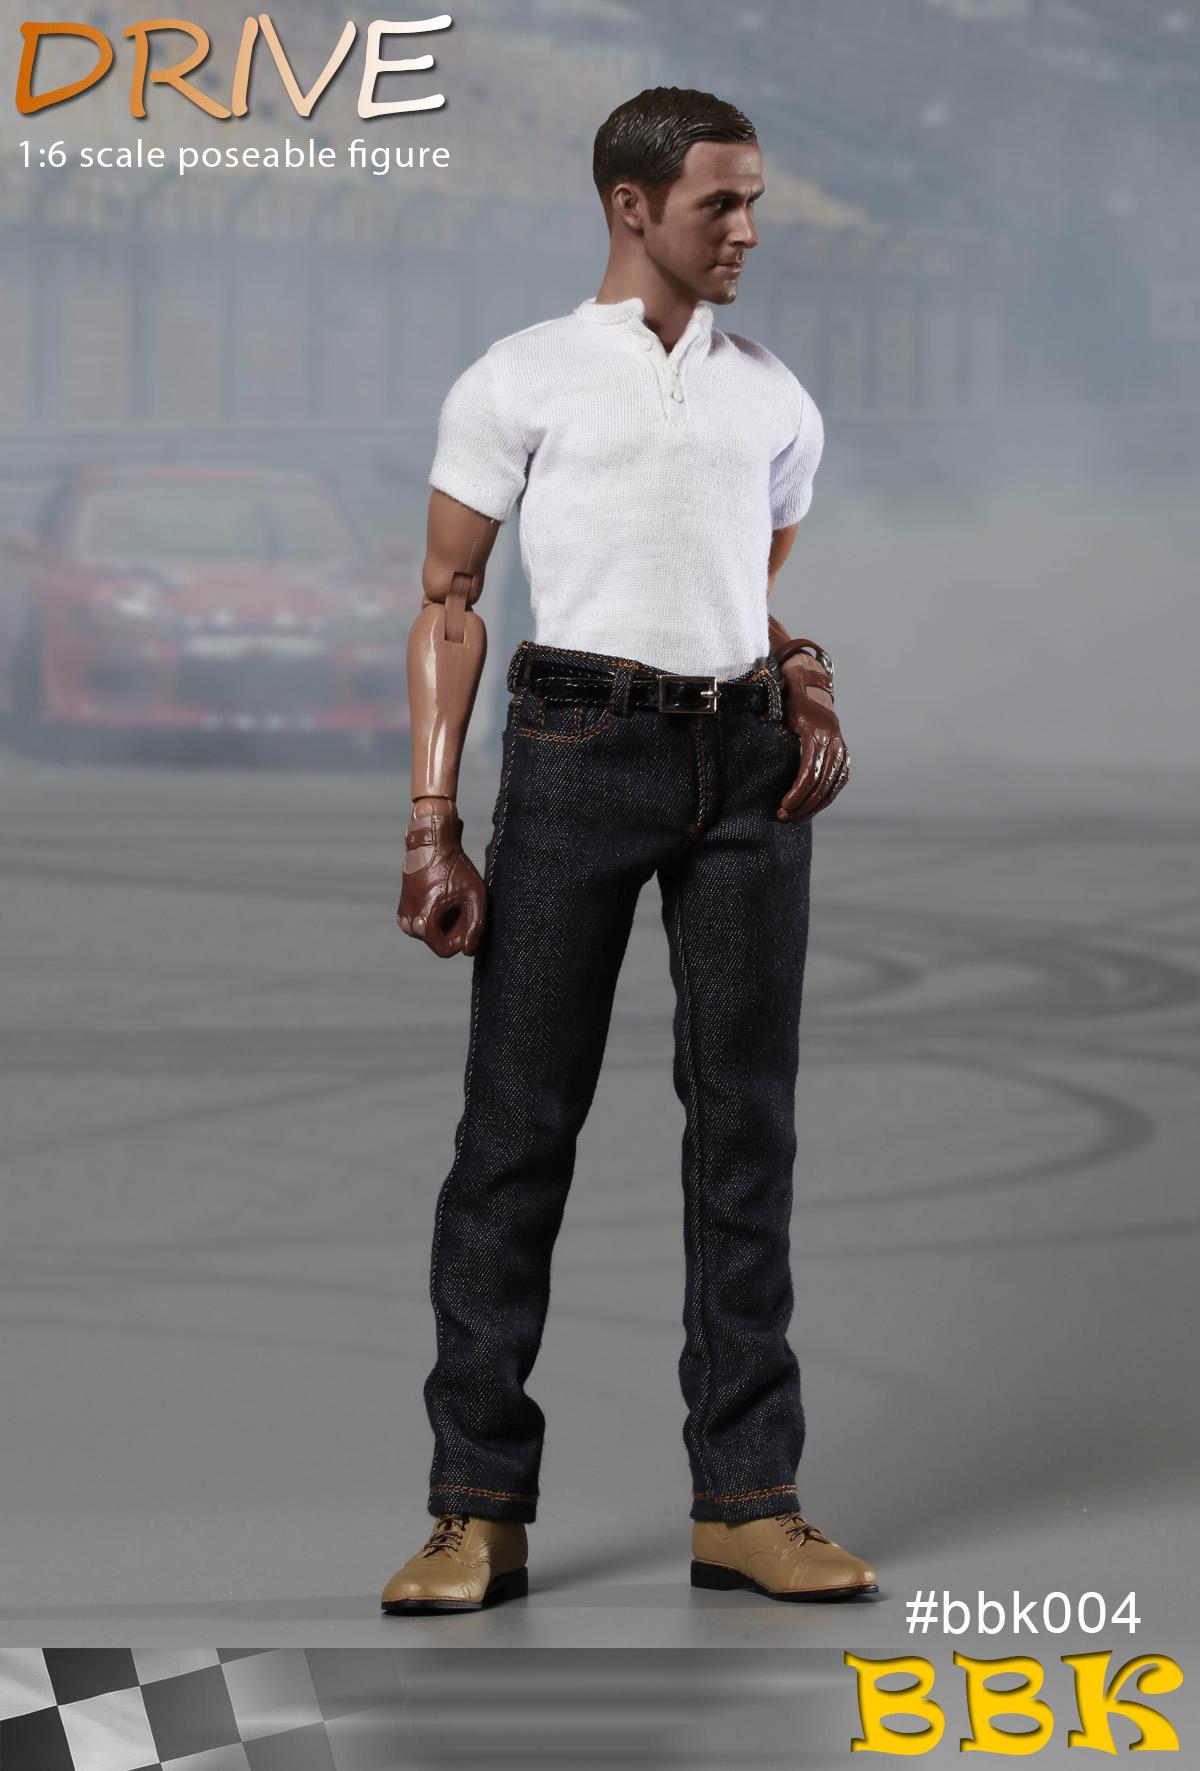 bbk-driver13